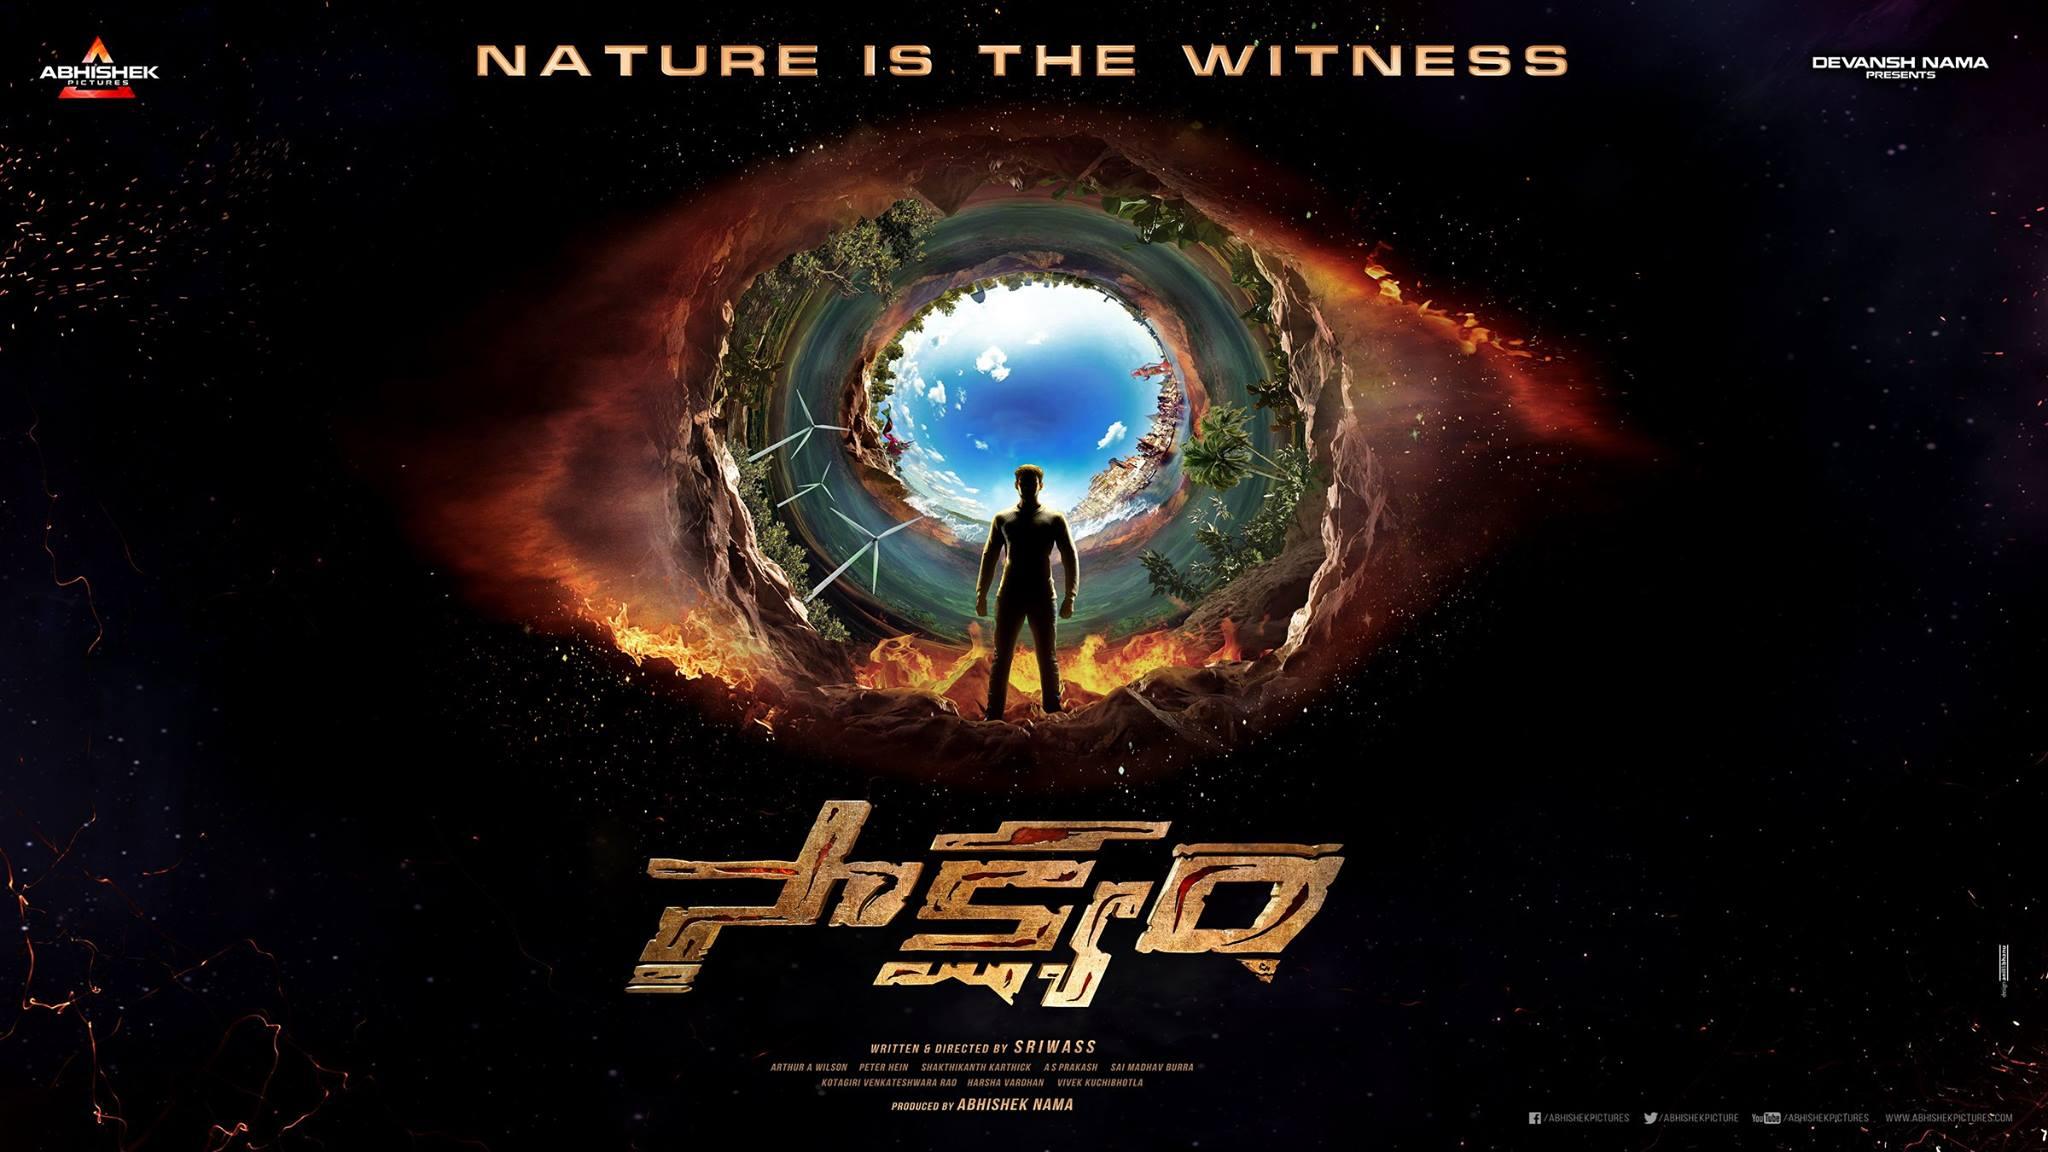 Srimanthudu Ultra Hd All Posters Wallpapers: Bellamkonda Srinivas Sakshyam Movie First Look ULTRA HD